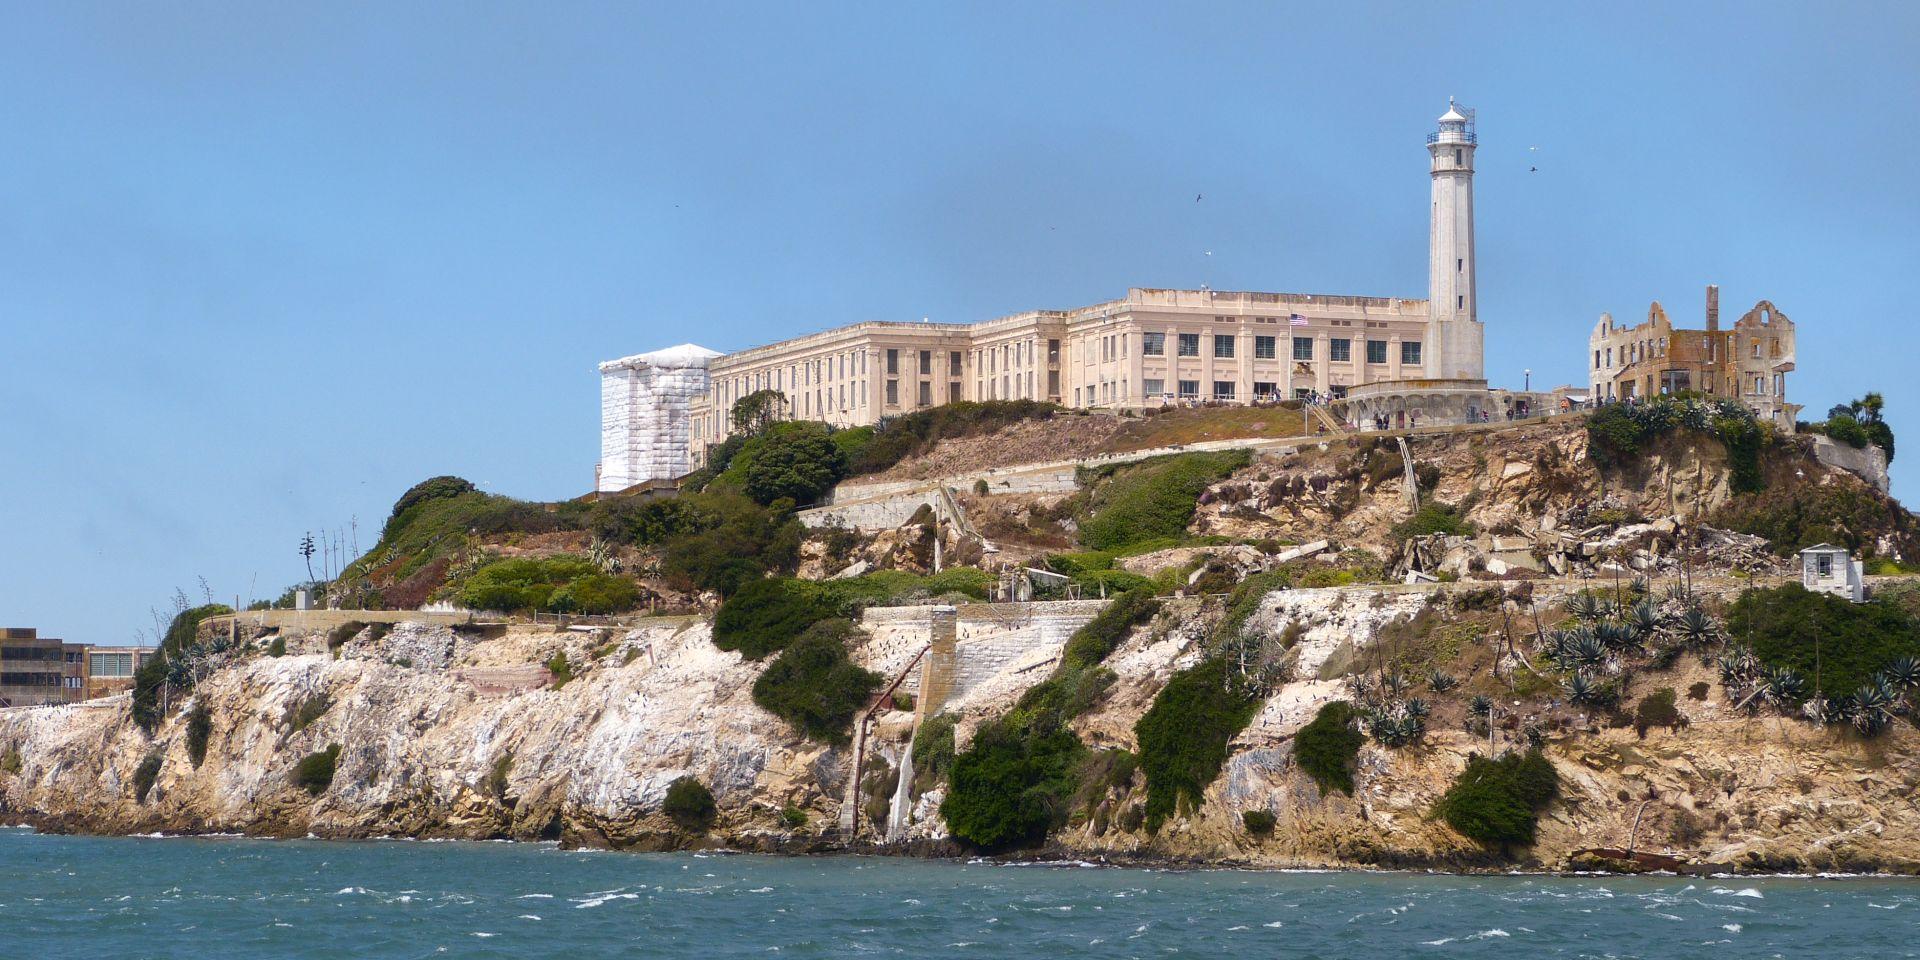 San Francisco – Alcatraz